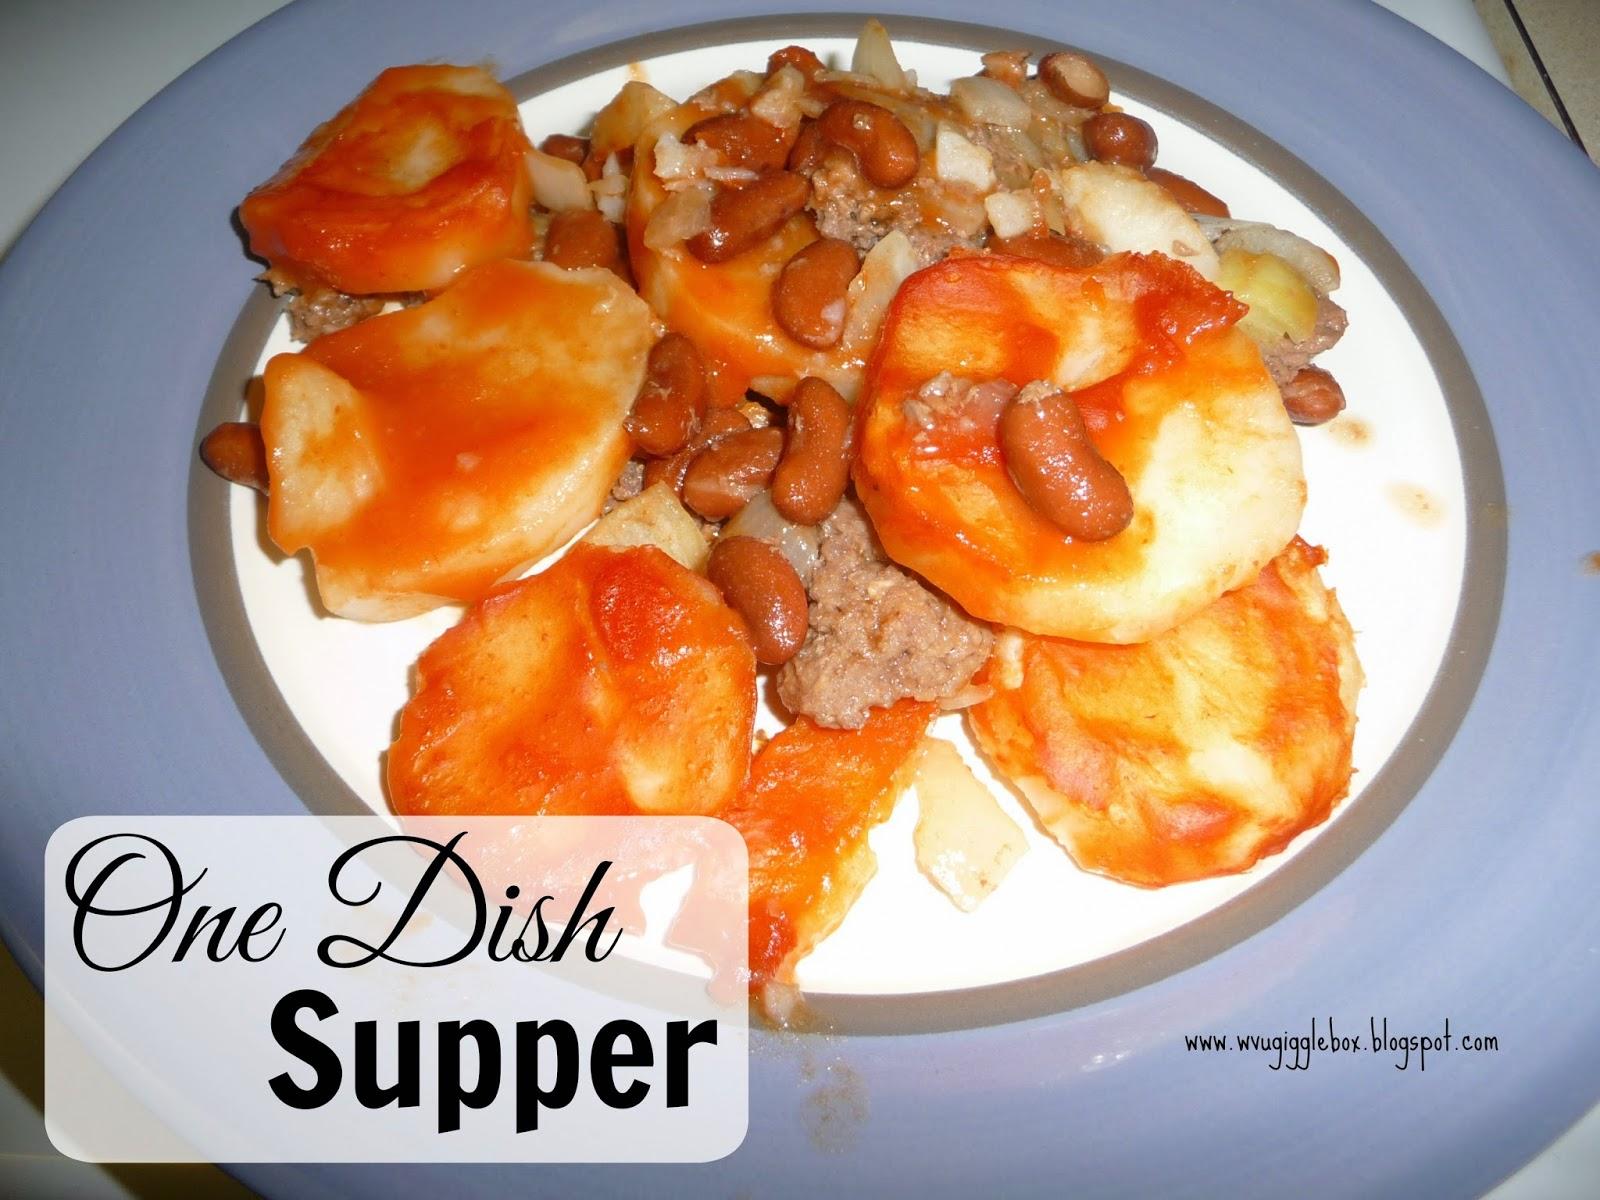 recipe, hamburger meat, potatoes, kidney beans, onions, dinner on a budget,